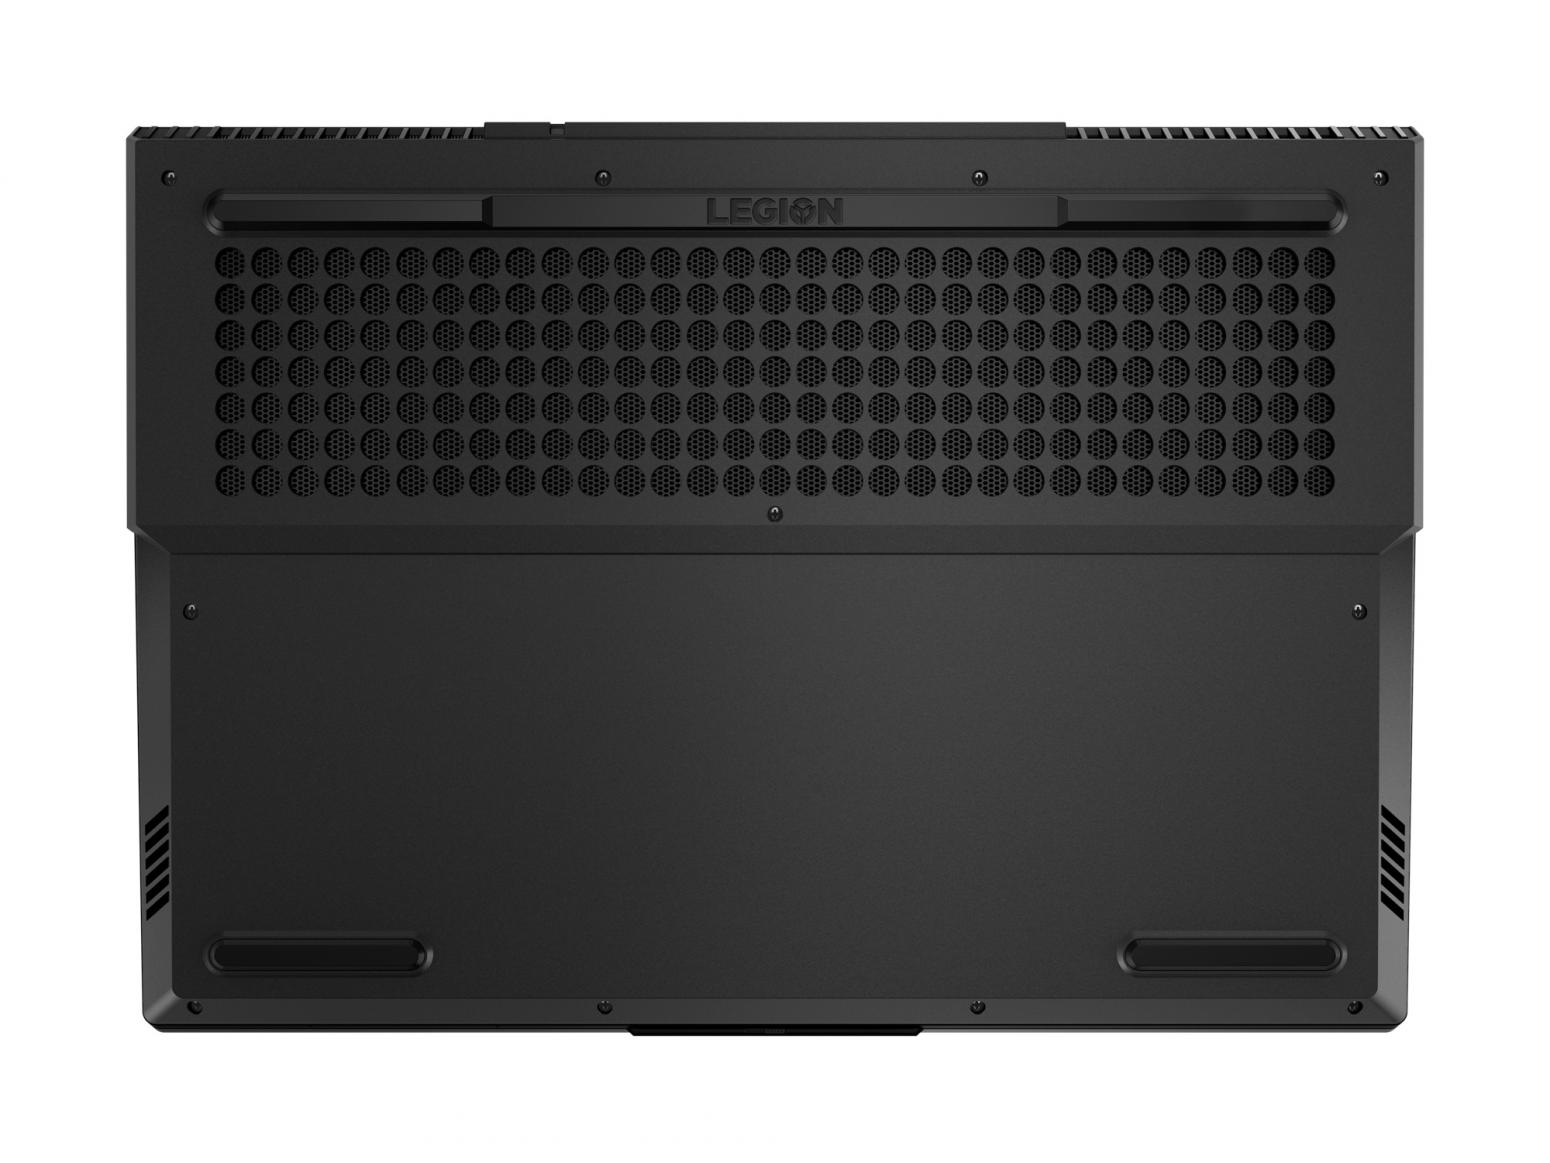 Ordinateur portable Lenovo Legion 5 15IMH05H (81Y6000QFR) - GTX 1660 Ti - photo 8